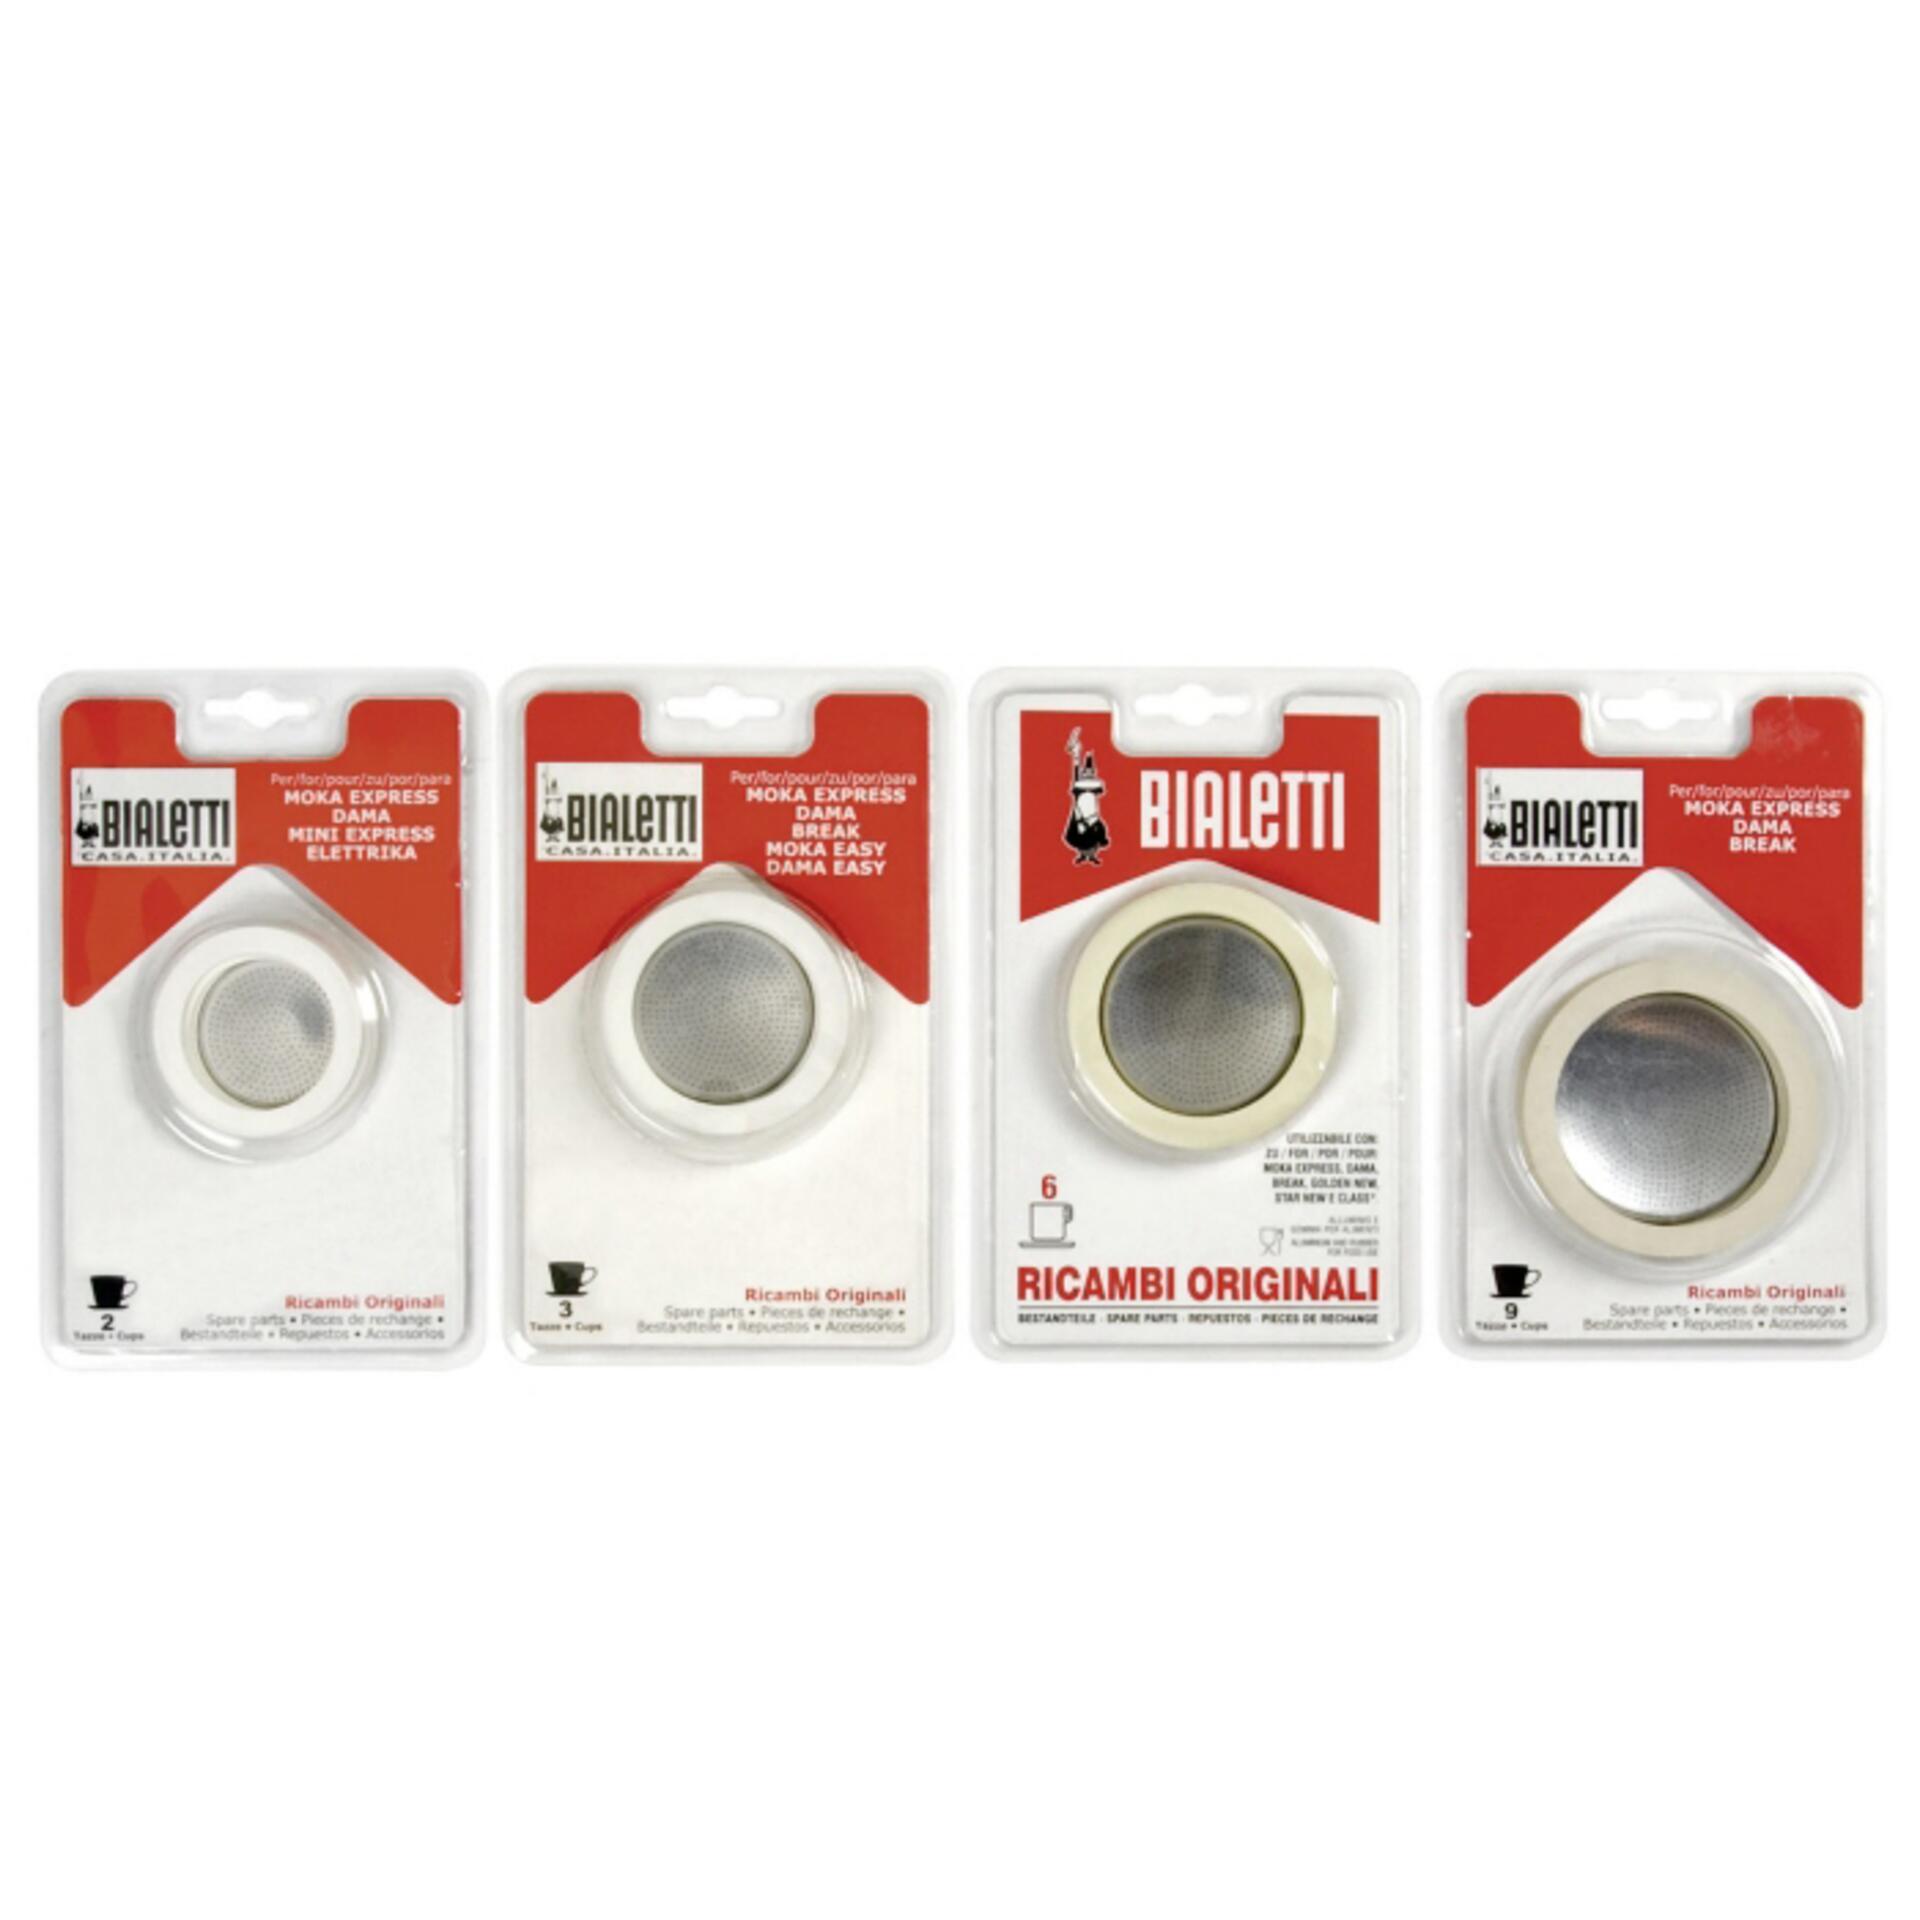 Bialetti Gummidichtung und Filter Aluminiummaschinen 2 Tassen